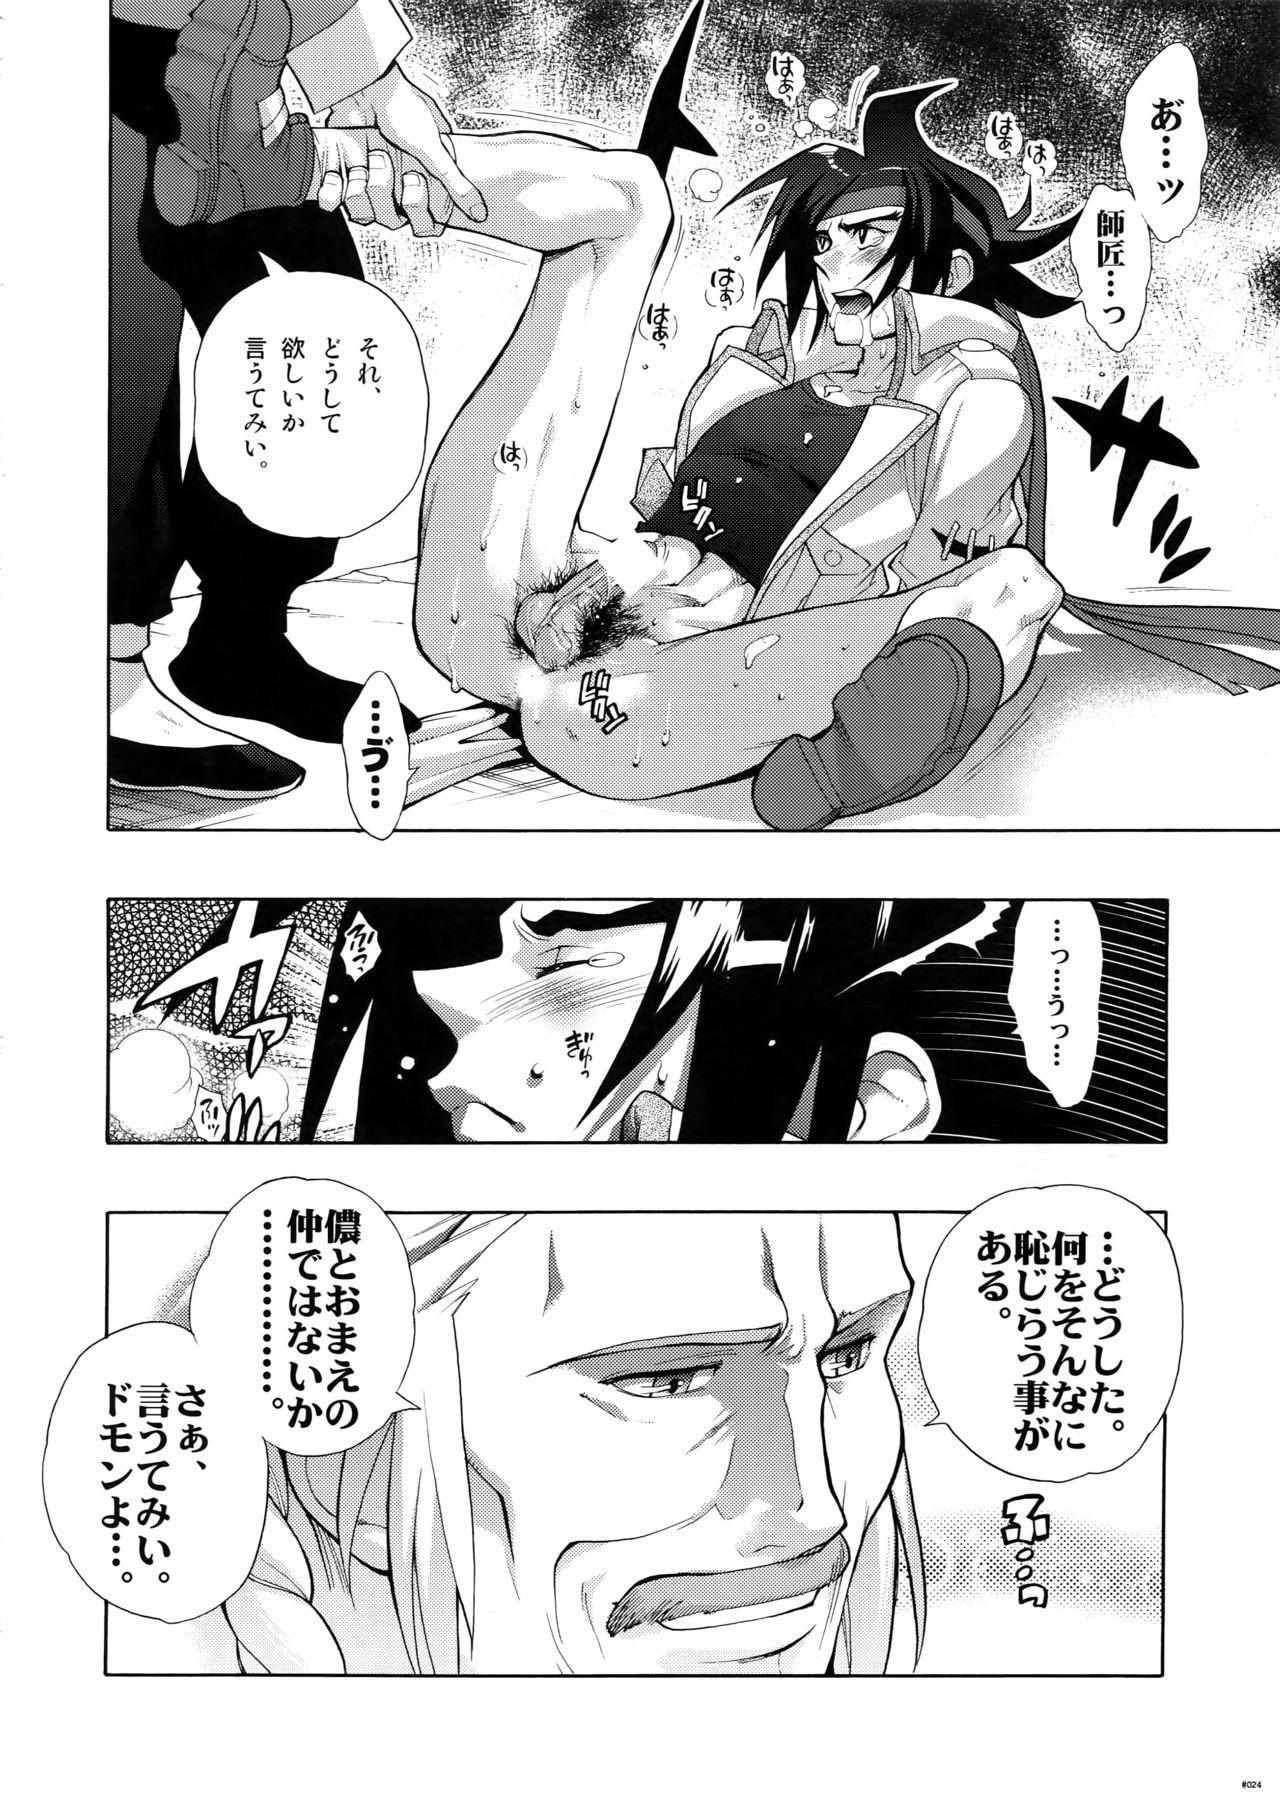 [Article 60 of Criminal Code (Shuhan)] G-gan Josei-Muke Sairoku-Shuu (G Gundam) 23